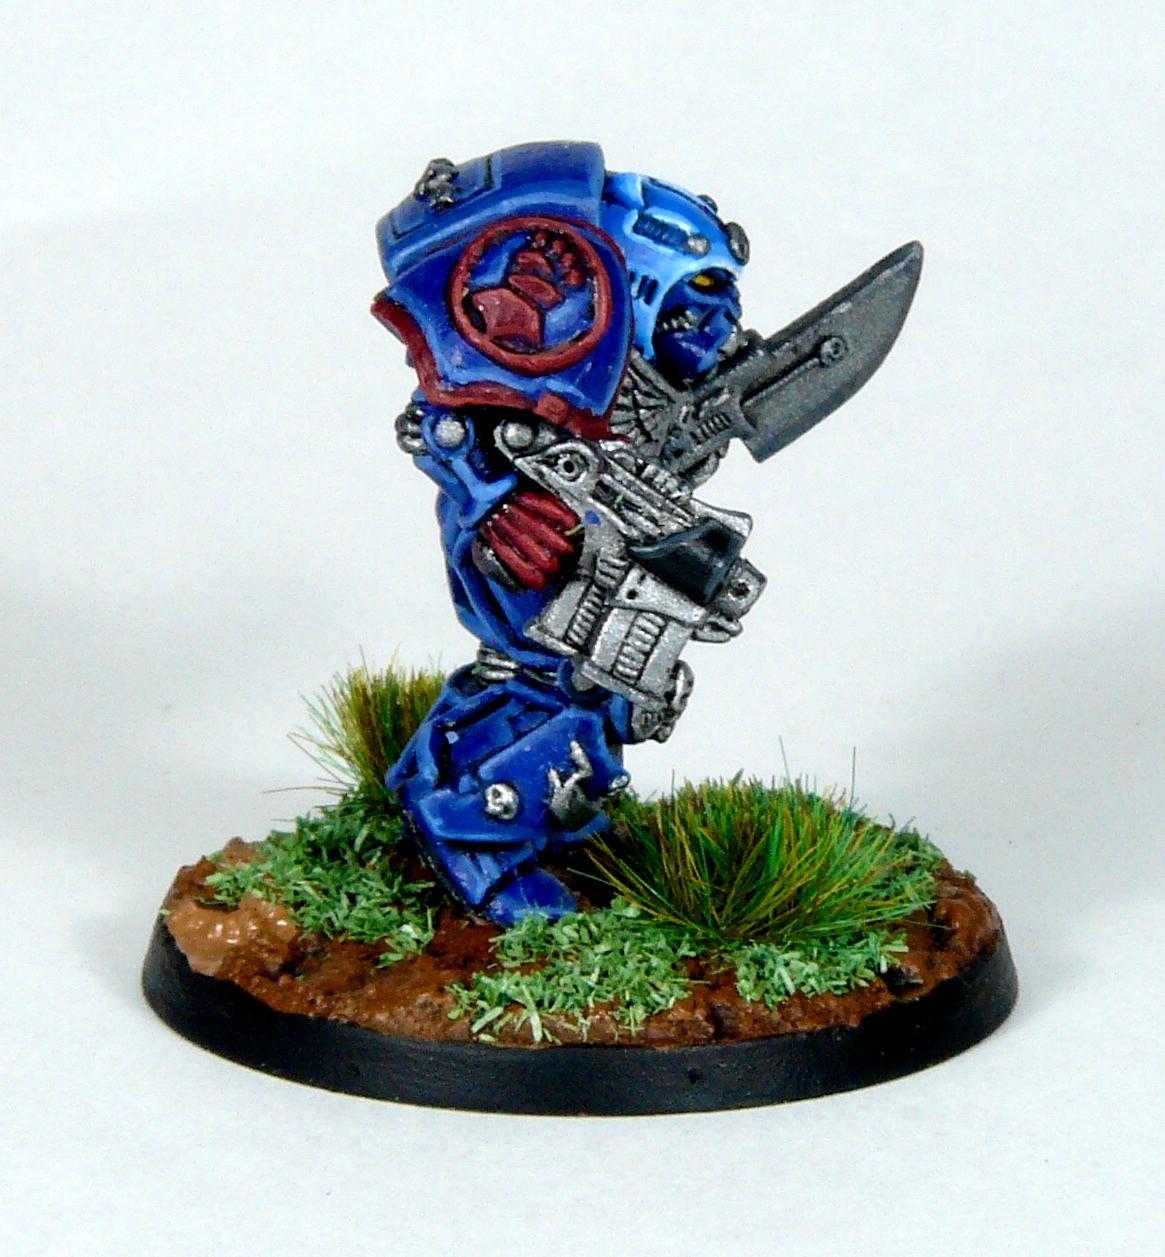 Crimson Fists, Librarian, Rogue Trader, Rtb9, Space Marines, Terminator Armor, Warhammer 40,000